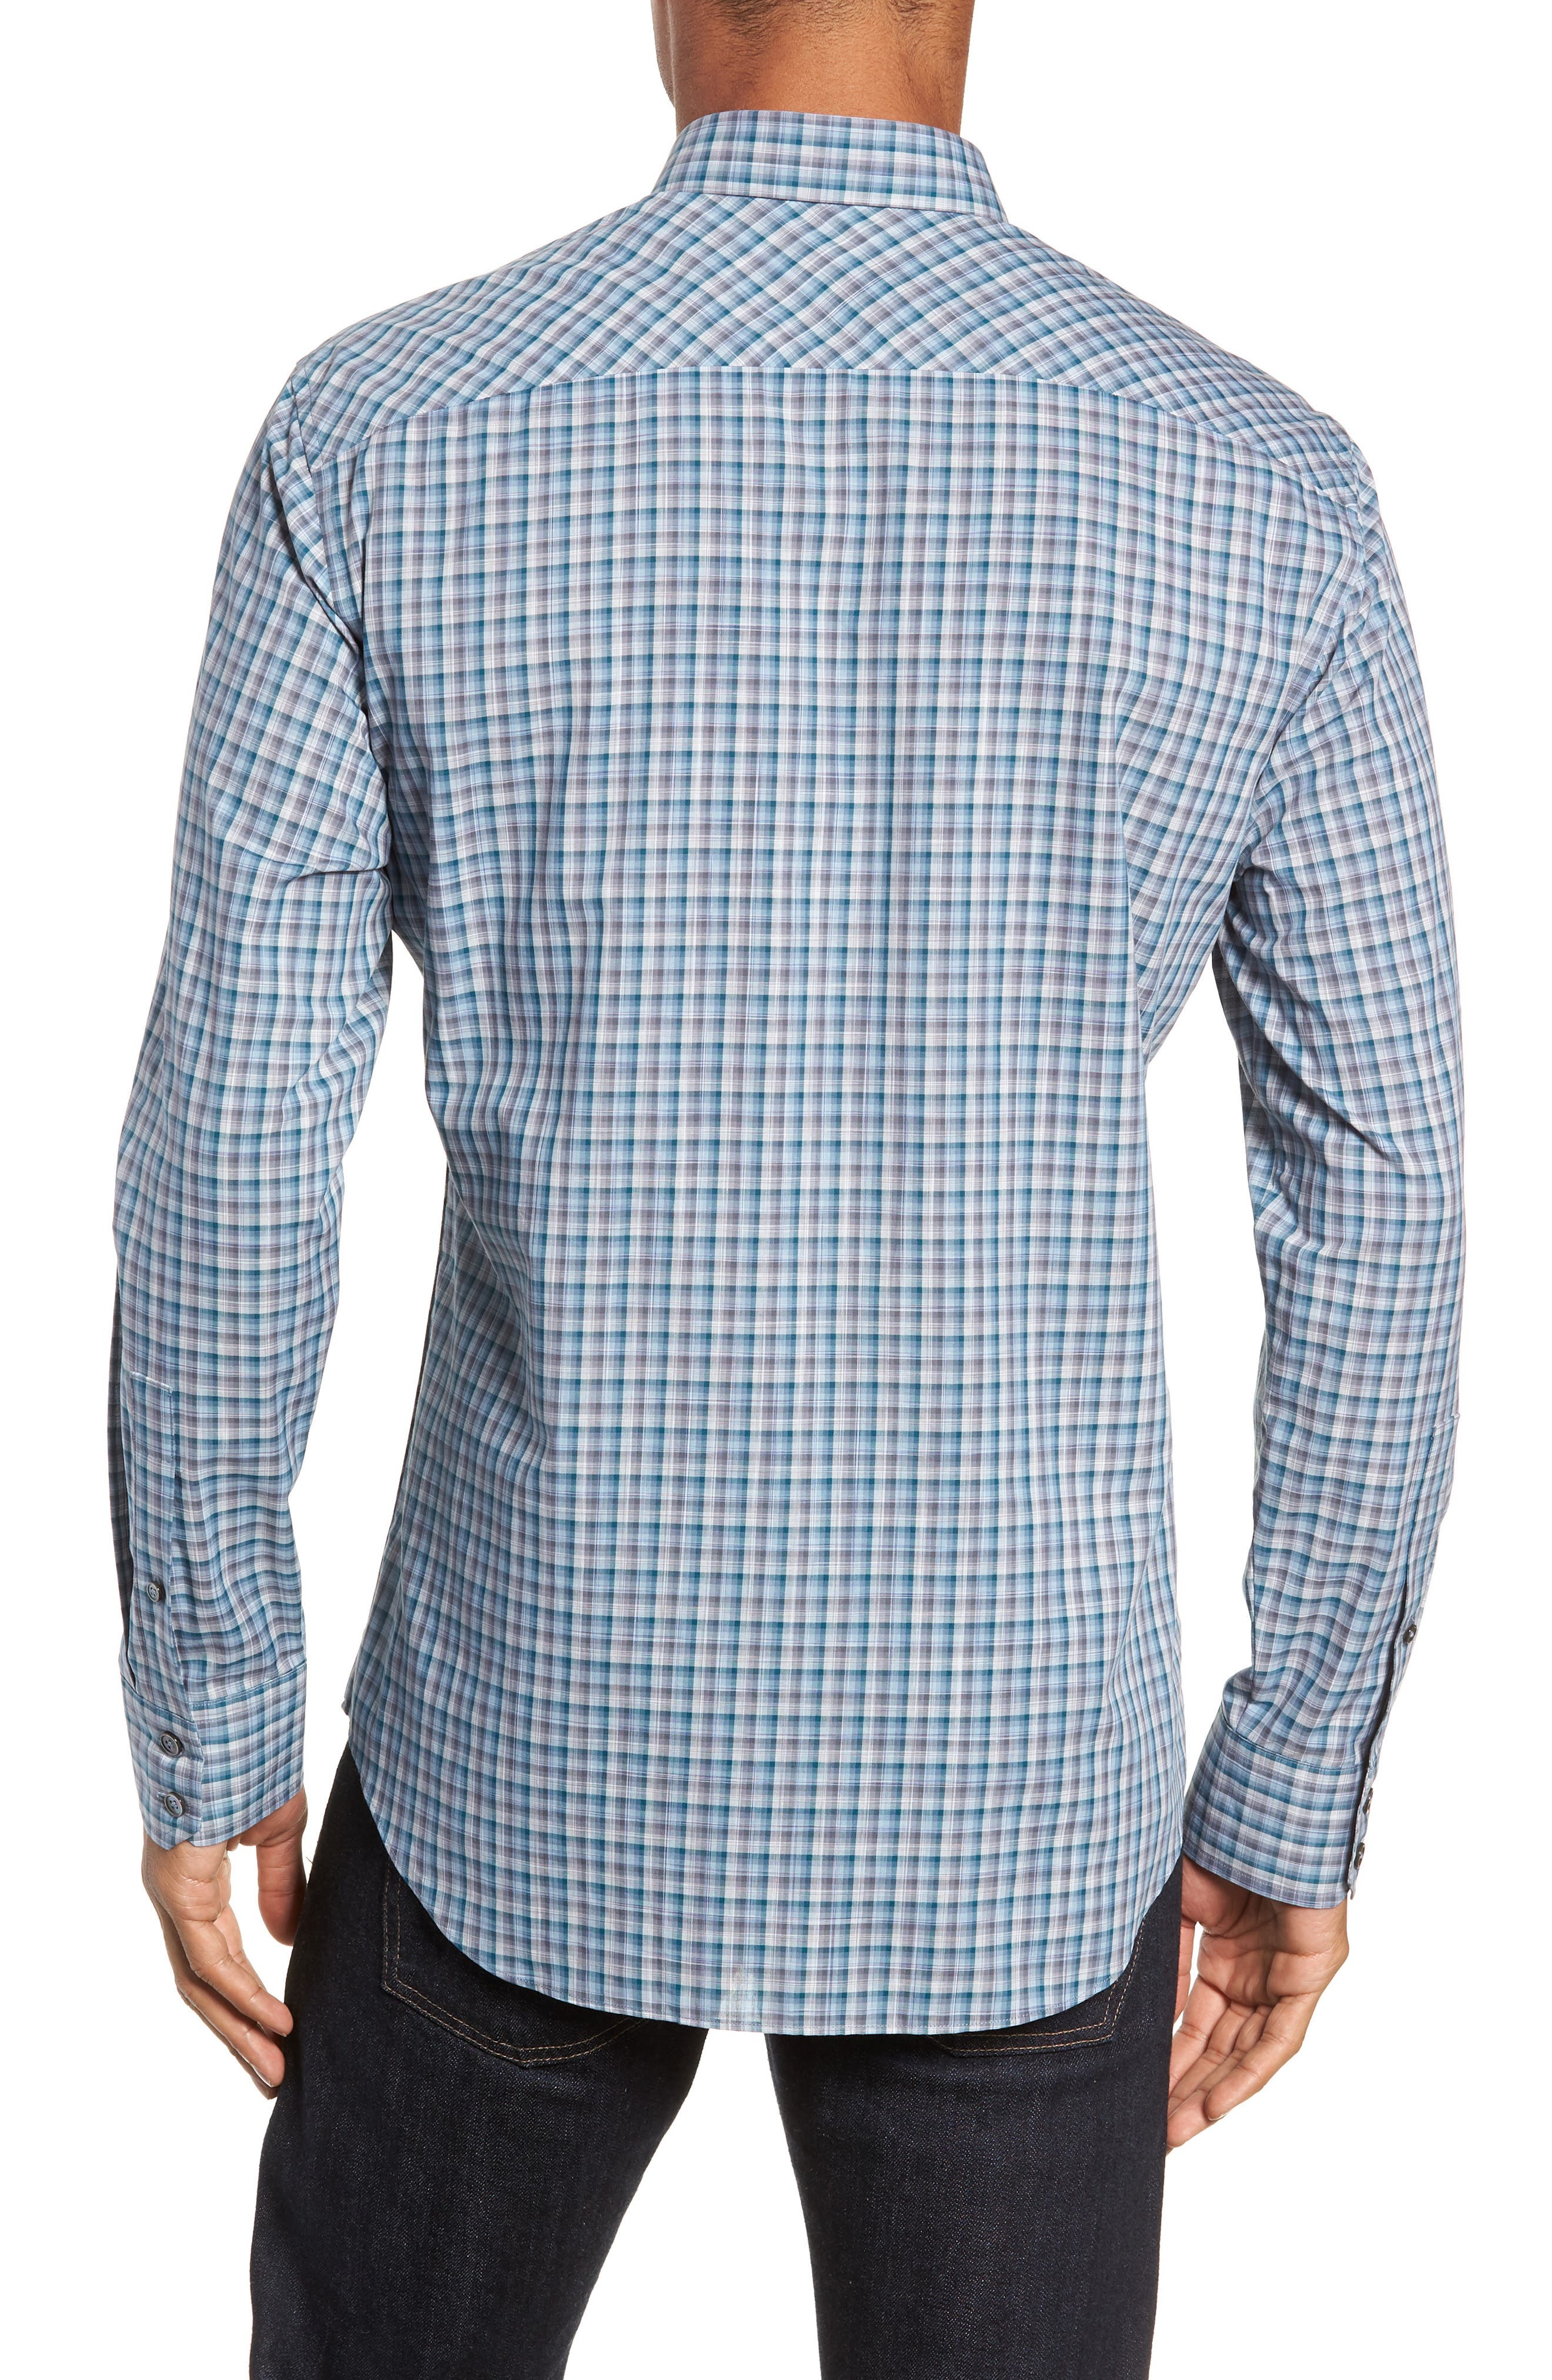 ZACHARY PRELL, Godinez Regular Fit Check Sport Shirt, Alternate thumbnail 3, color, 475